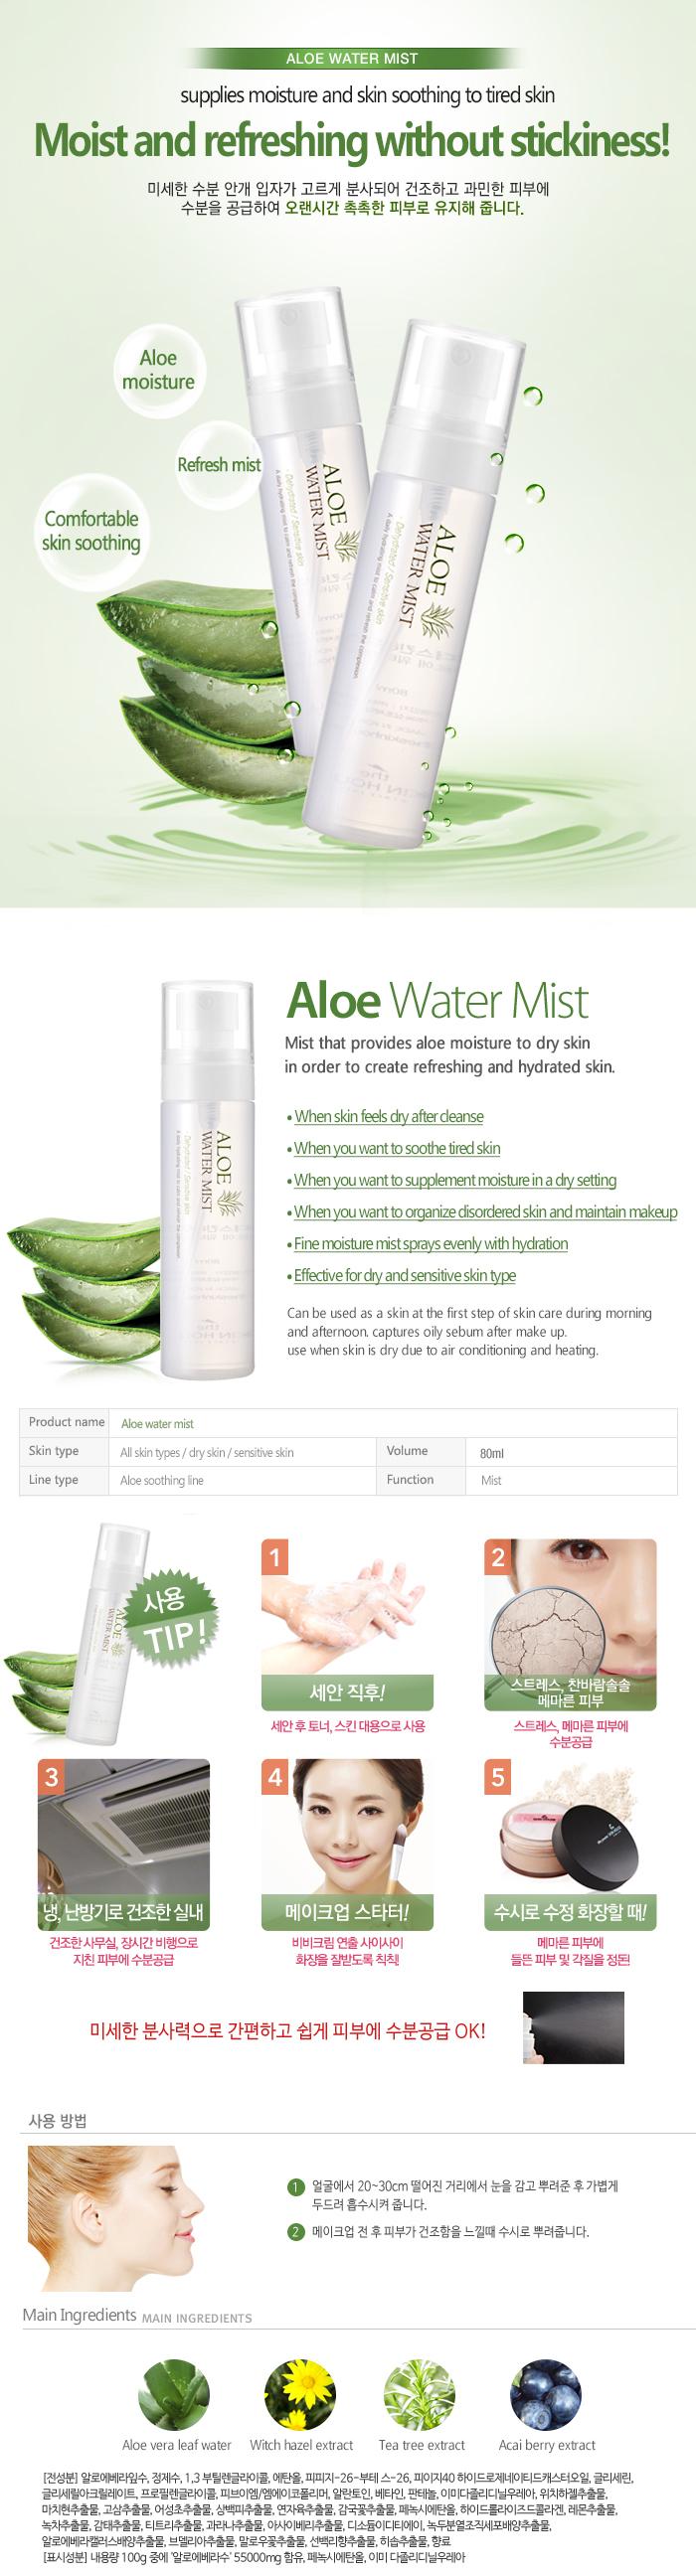 Aloe Water Mist